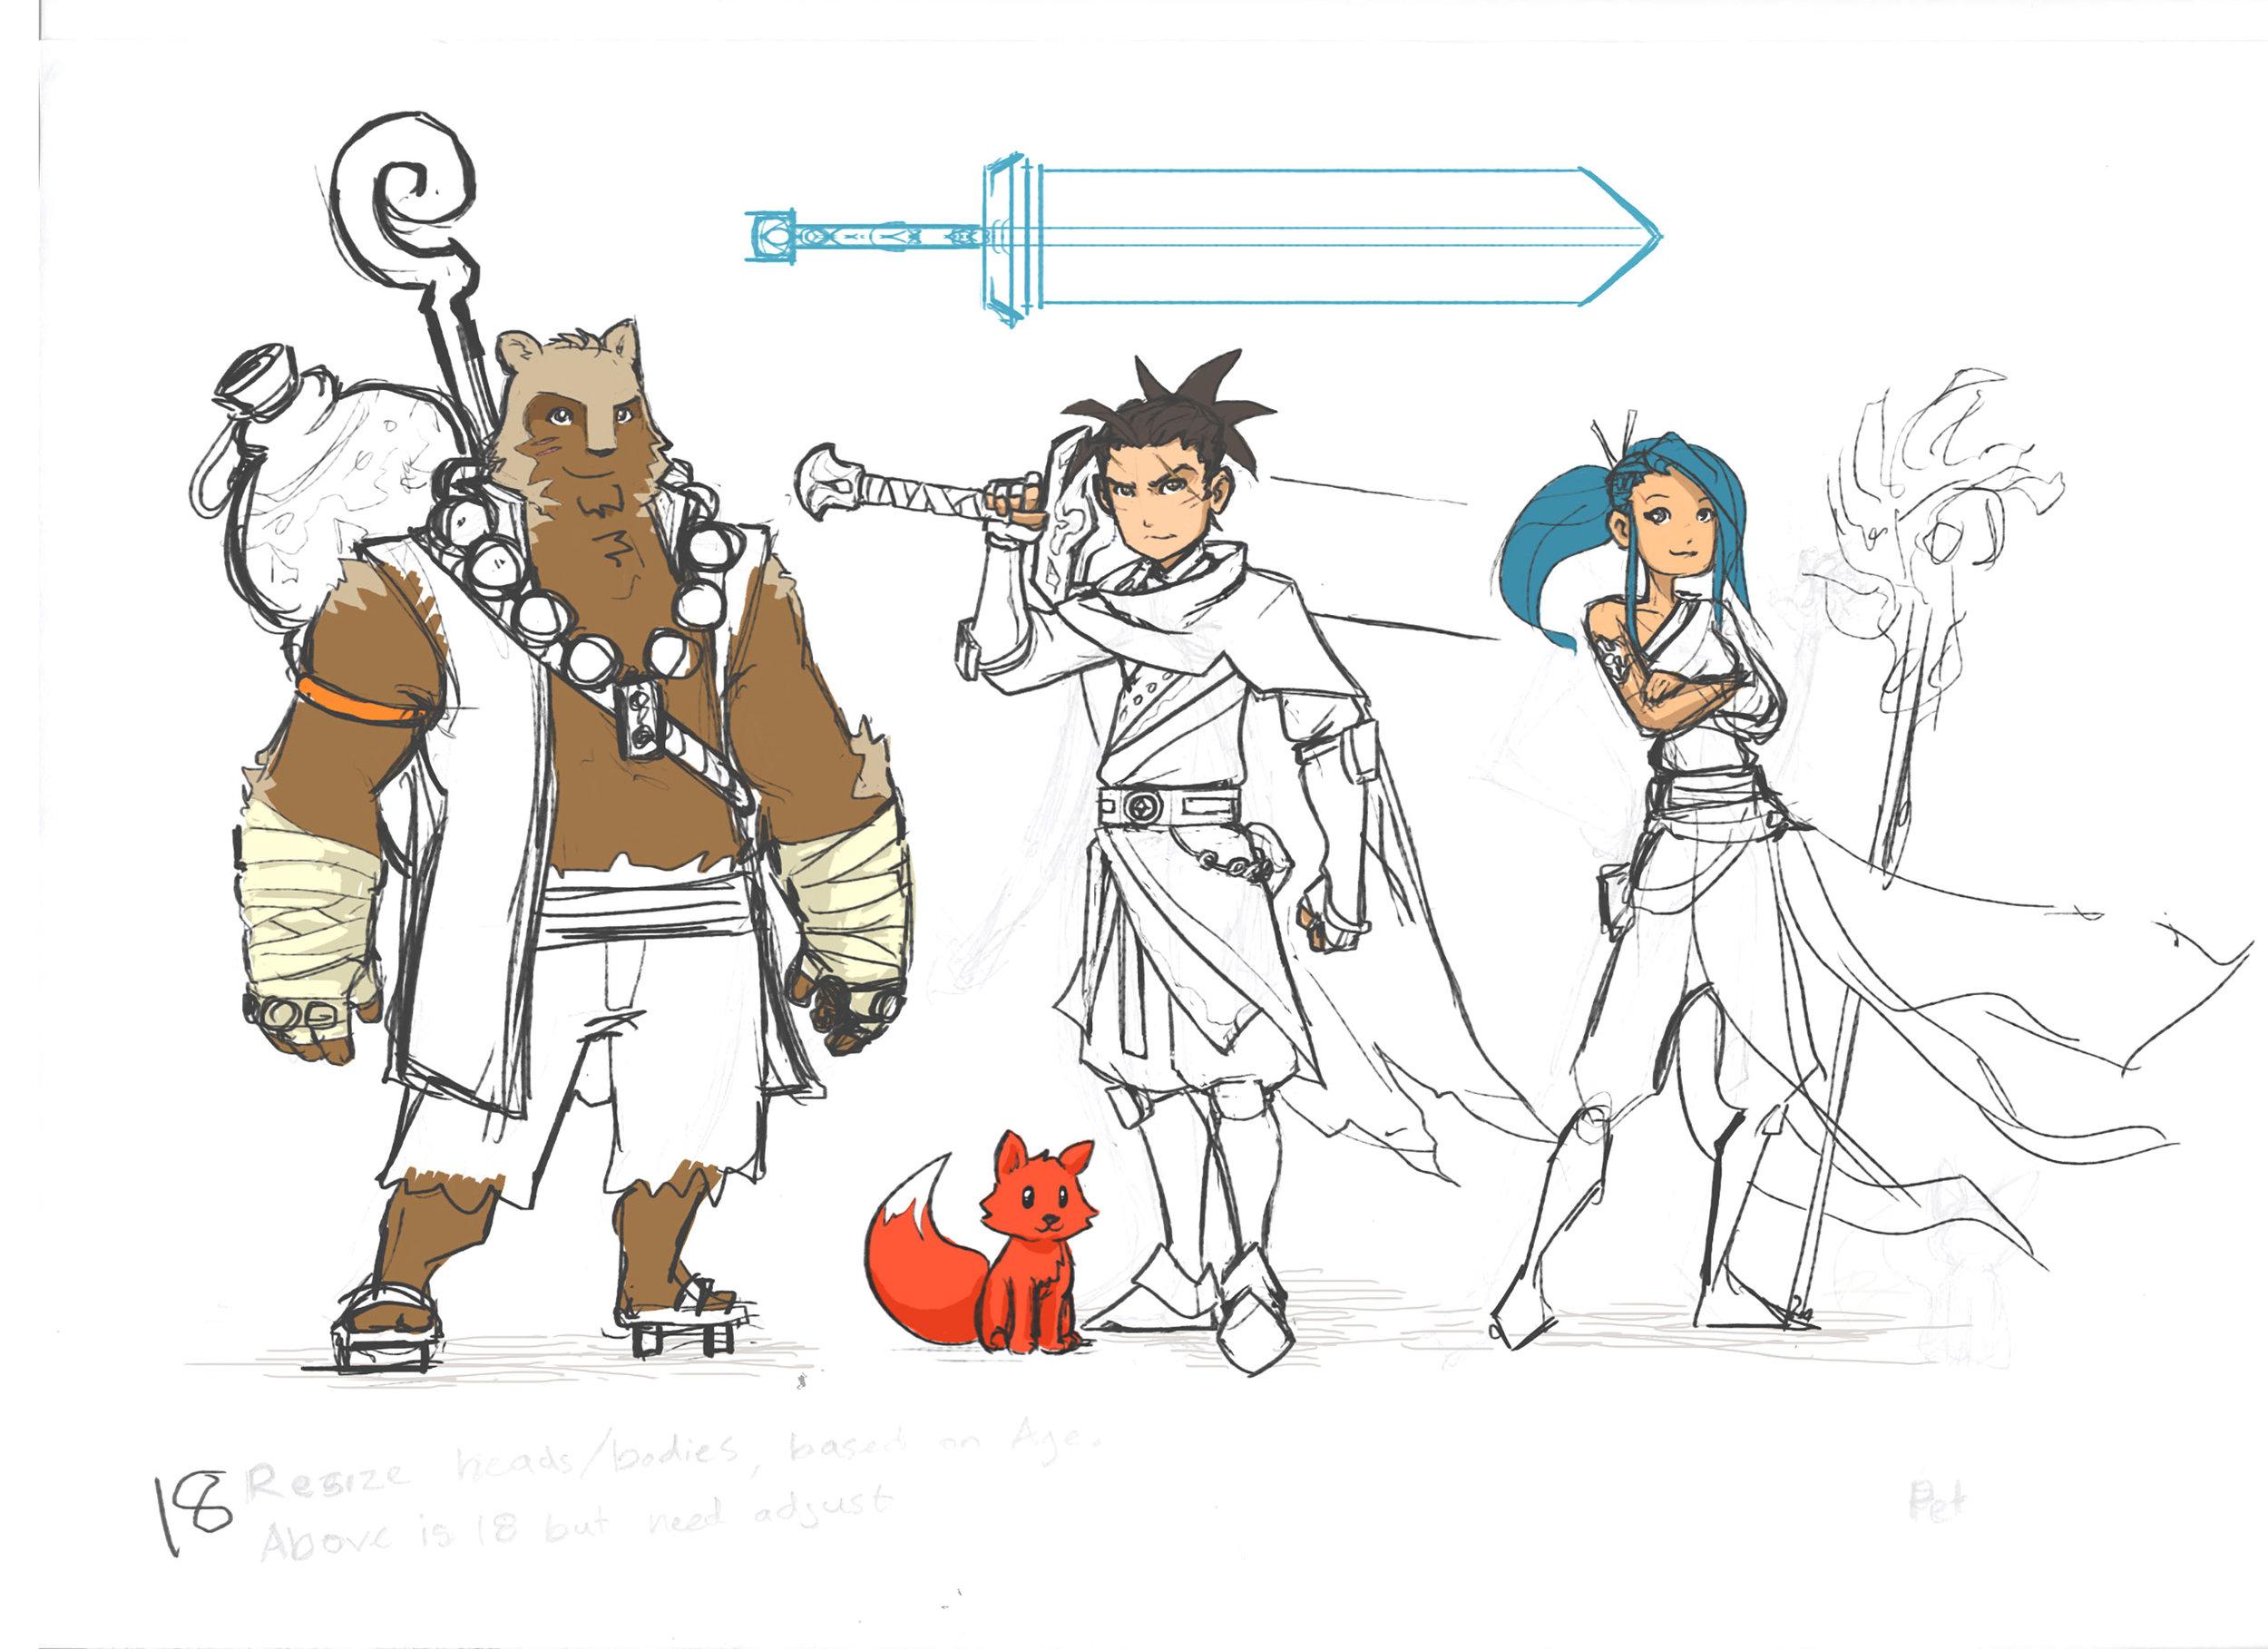 regan_characterdesign_old1.jpg